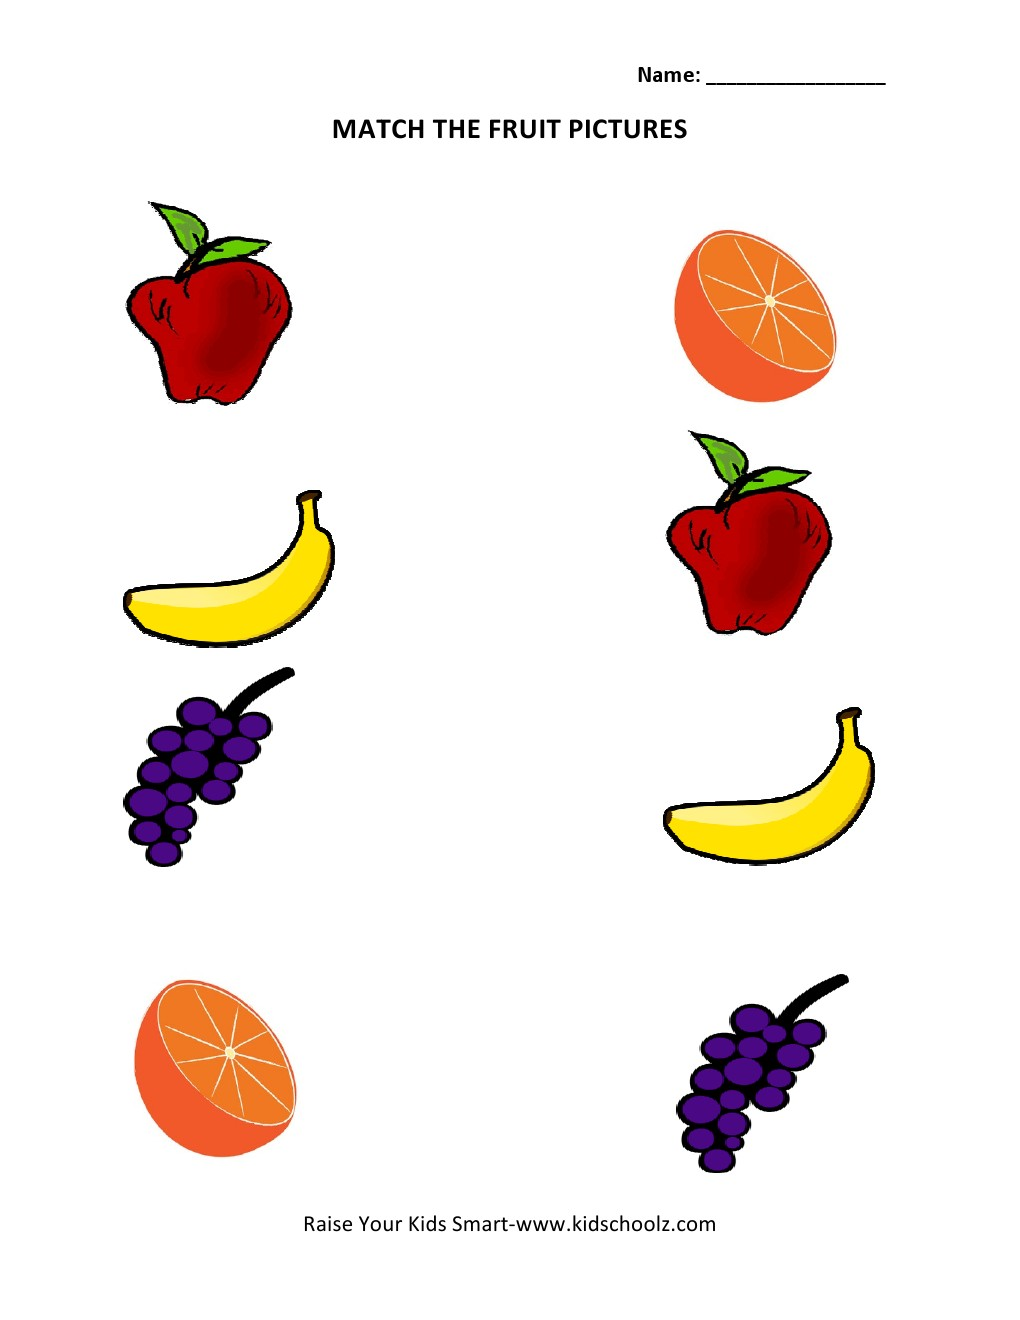 Workbooks matching preschool worksheets : Picture Matching Worksheets - Fruits - Kidschoolz